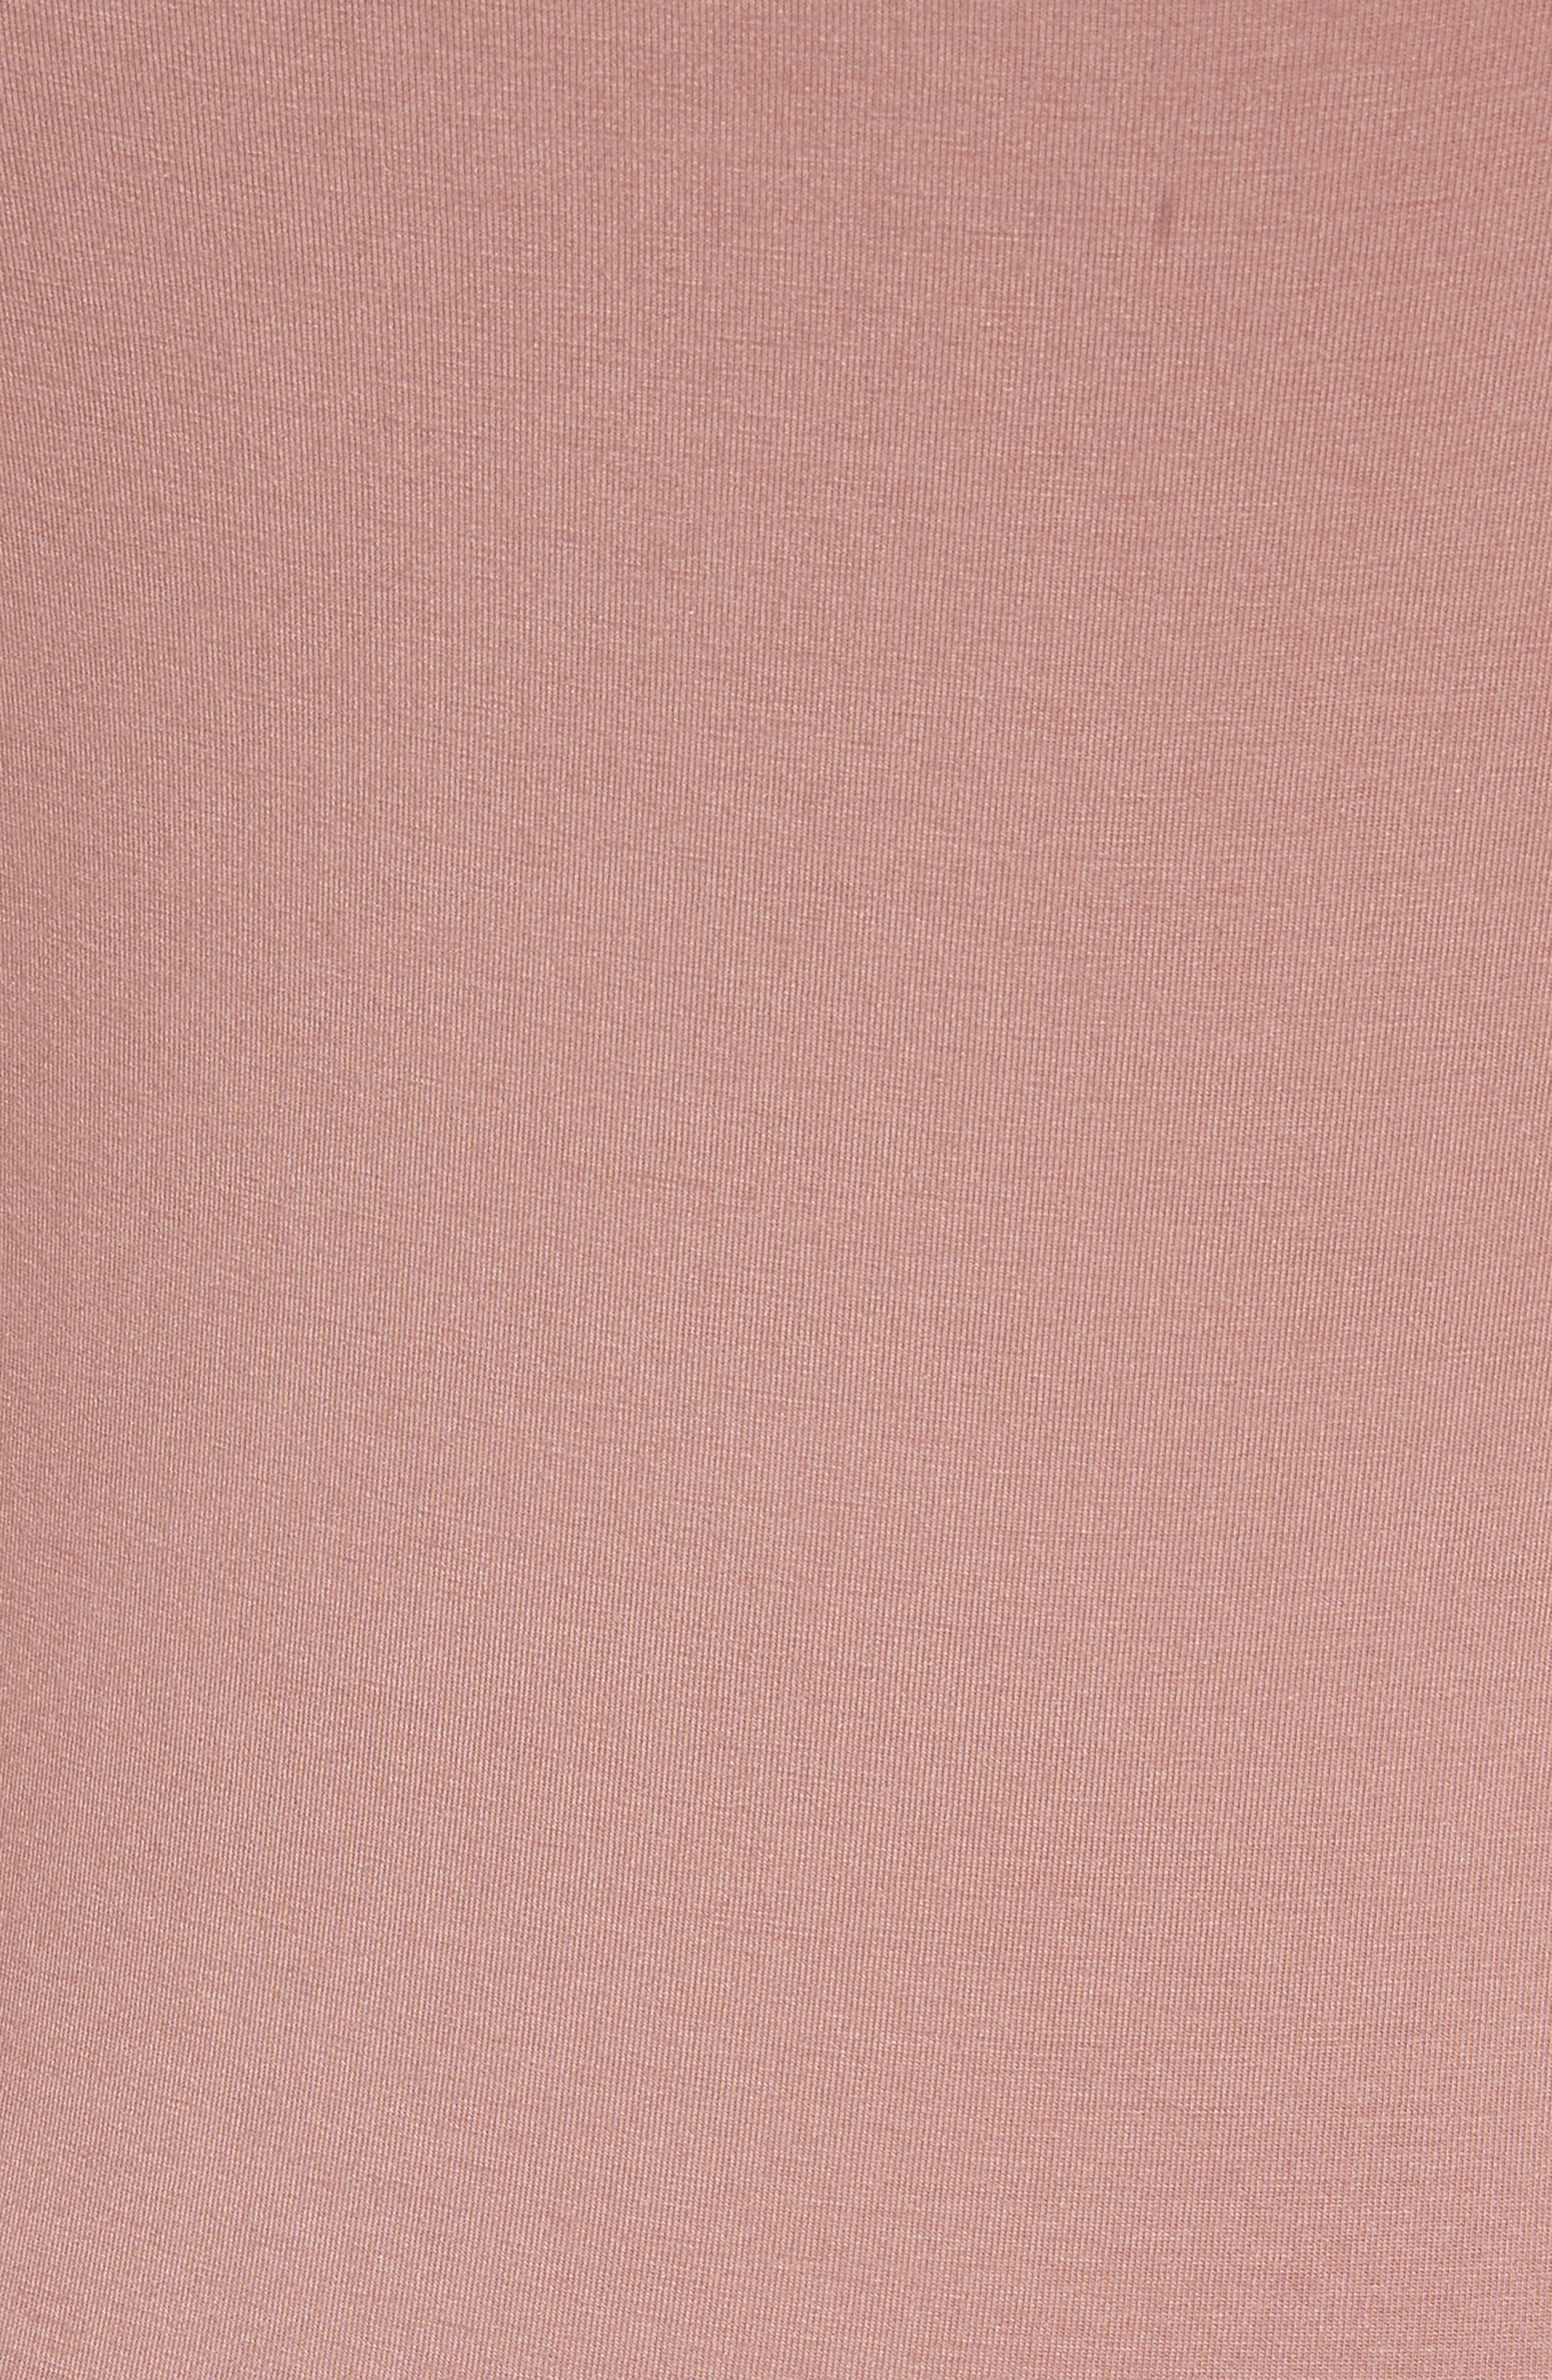 Stretch Jersey Cold Shoulder Dress,                             Alternate thumbnail 5, color,                             Guava